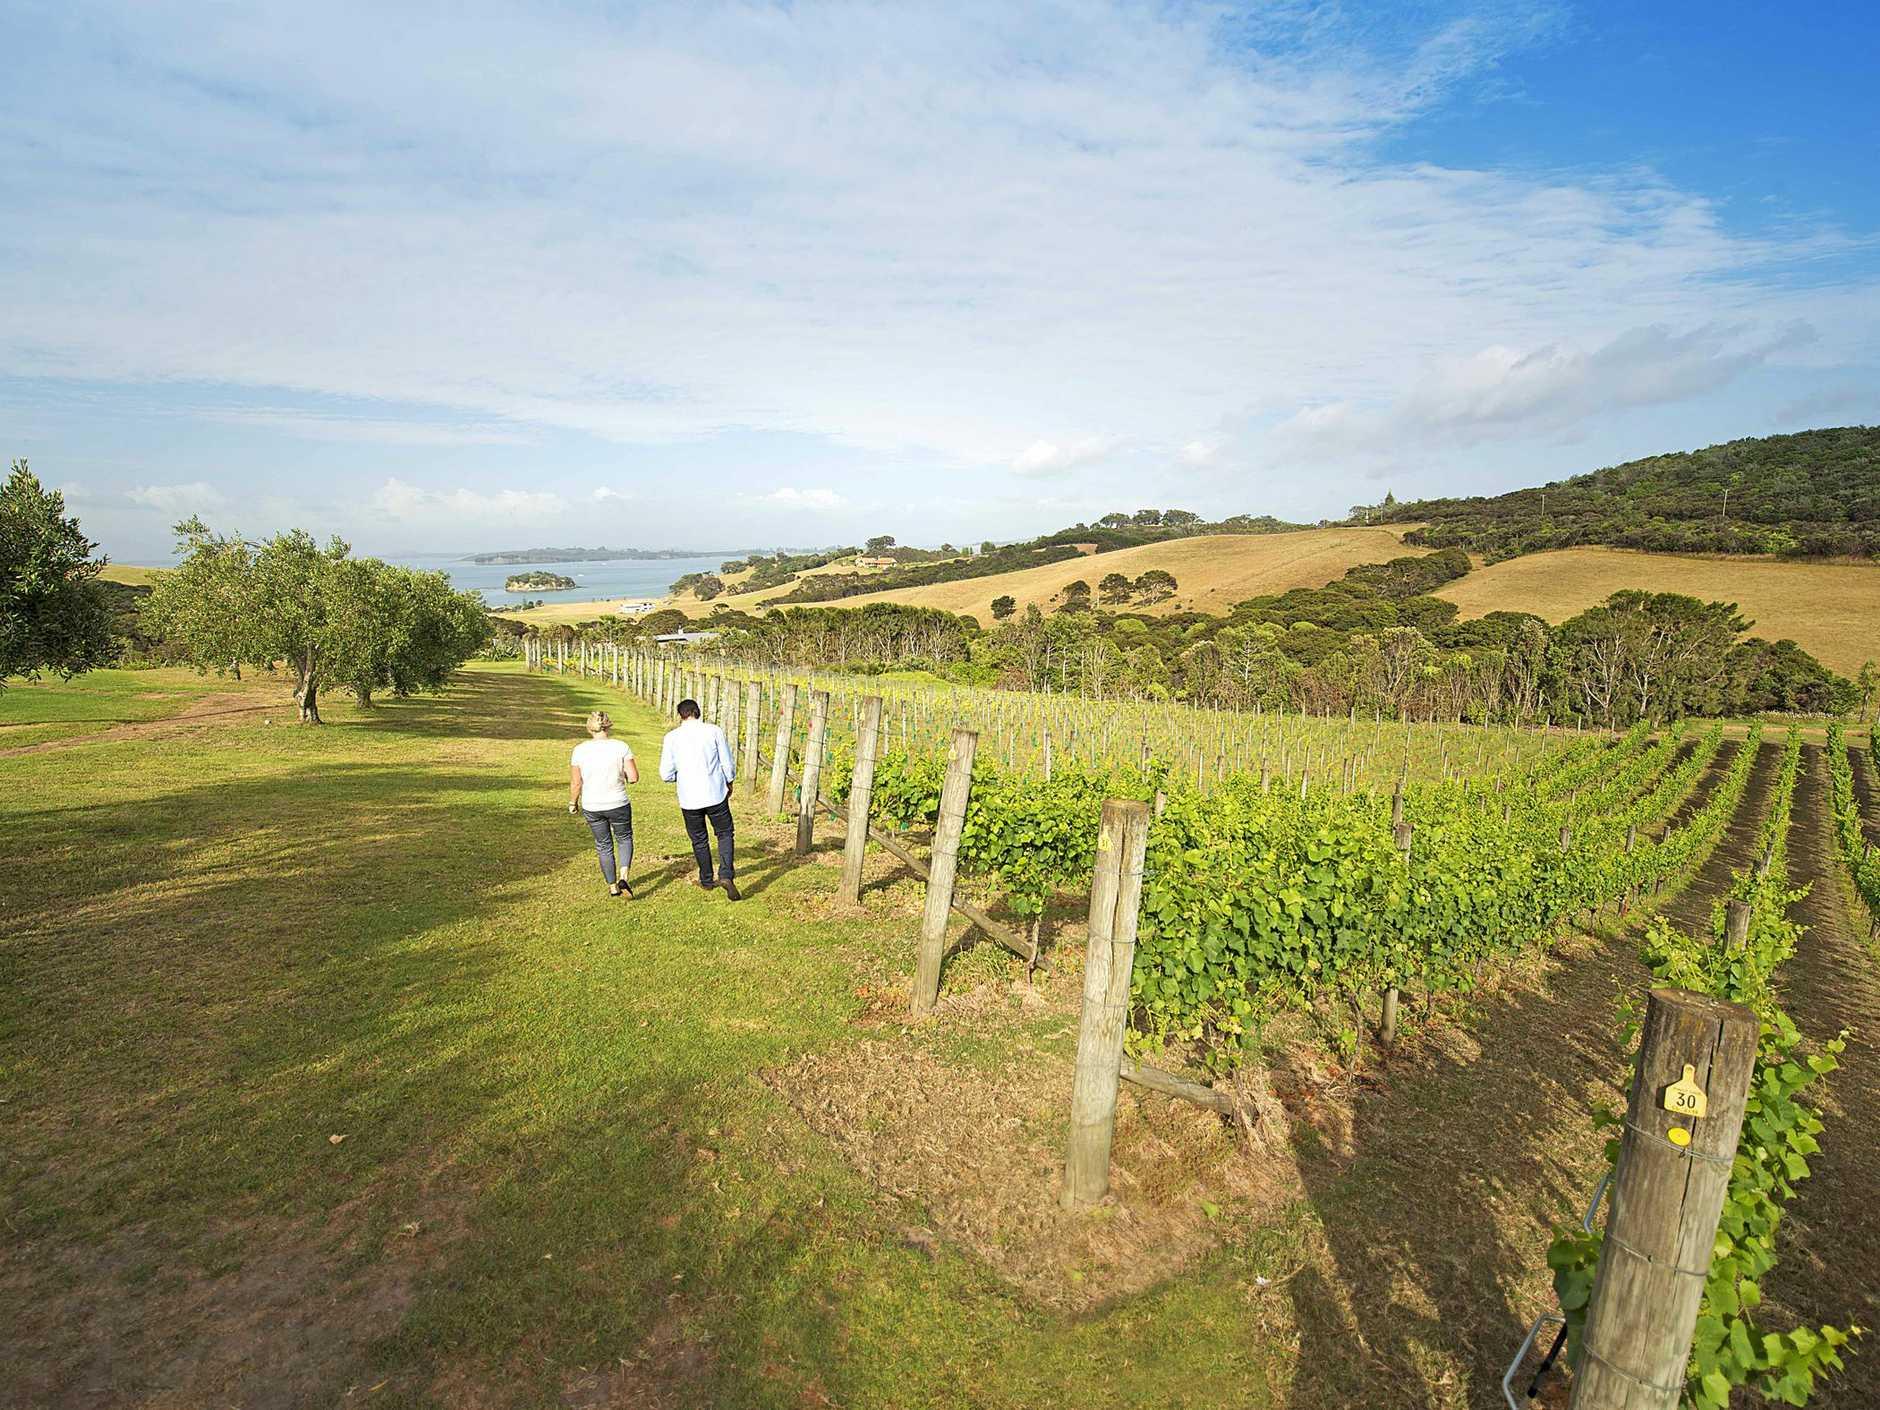 TRAVEL: Enjoy visiting New Zealand's Waiheke Island, near Auckland.